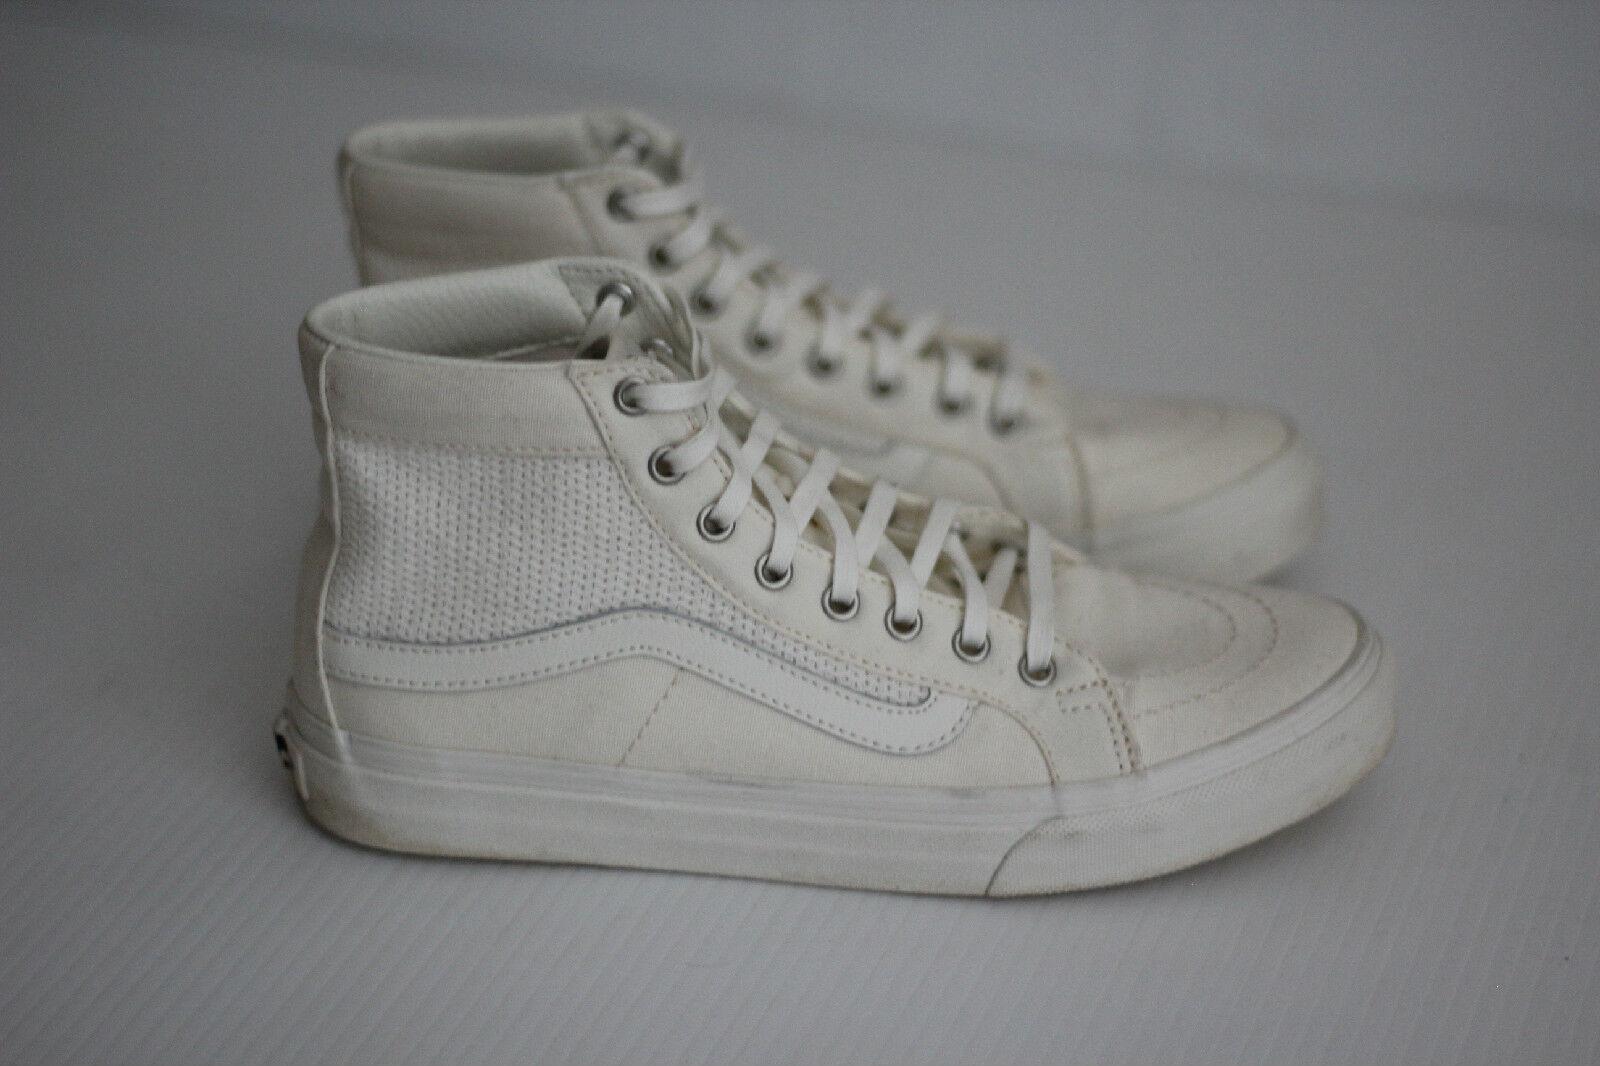 Vans Classic - Sk8 Hi Top Sneaker - Classic All White / True White - Uomo 6.5 US - 721356 b96ddd